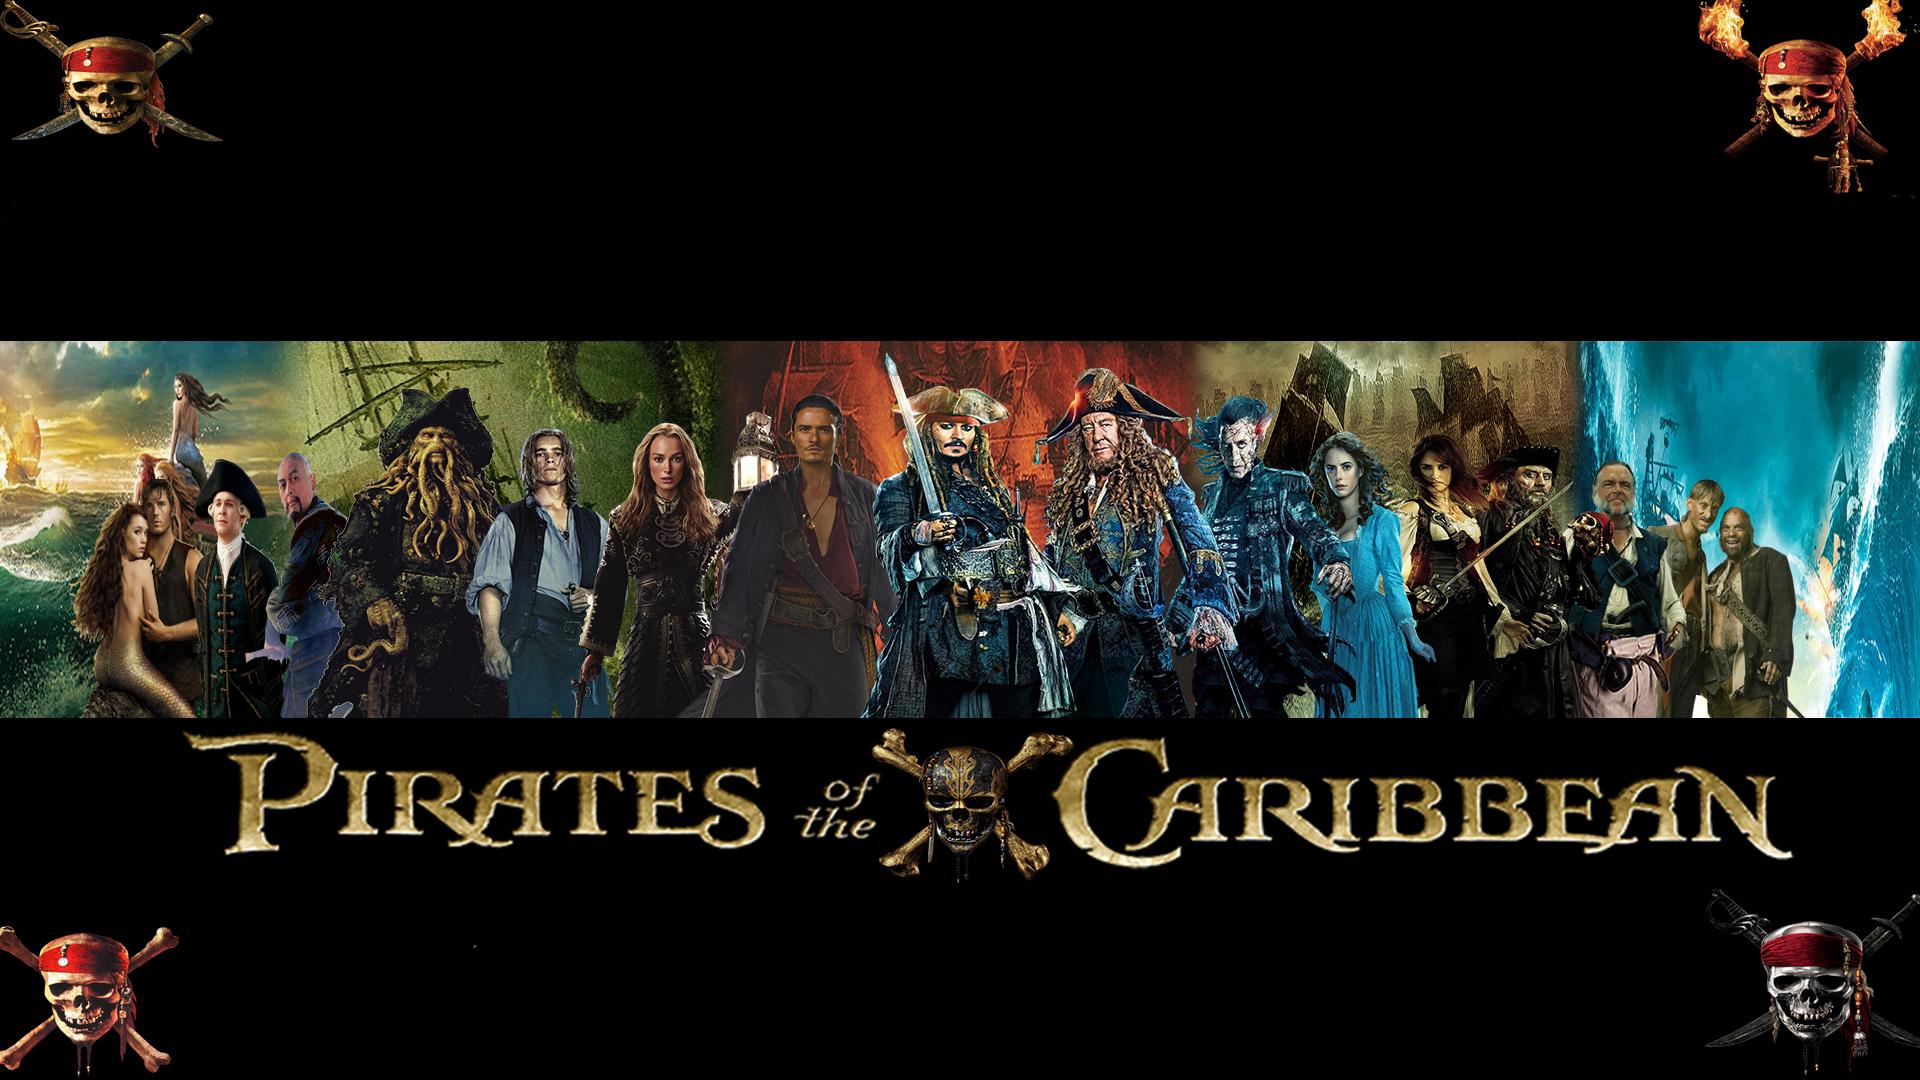 pirates of the caribbean 1-5 legacy wallpaperthe-dark-mamba-995